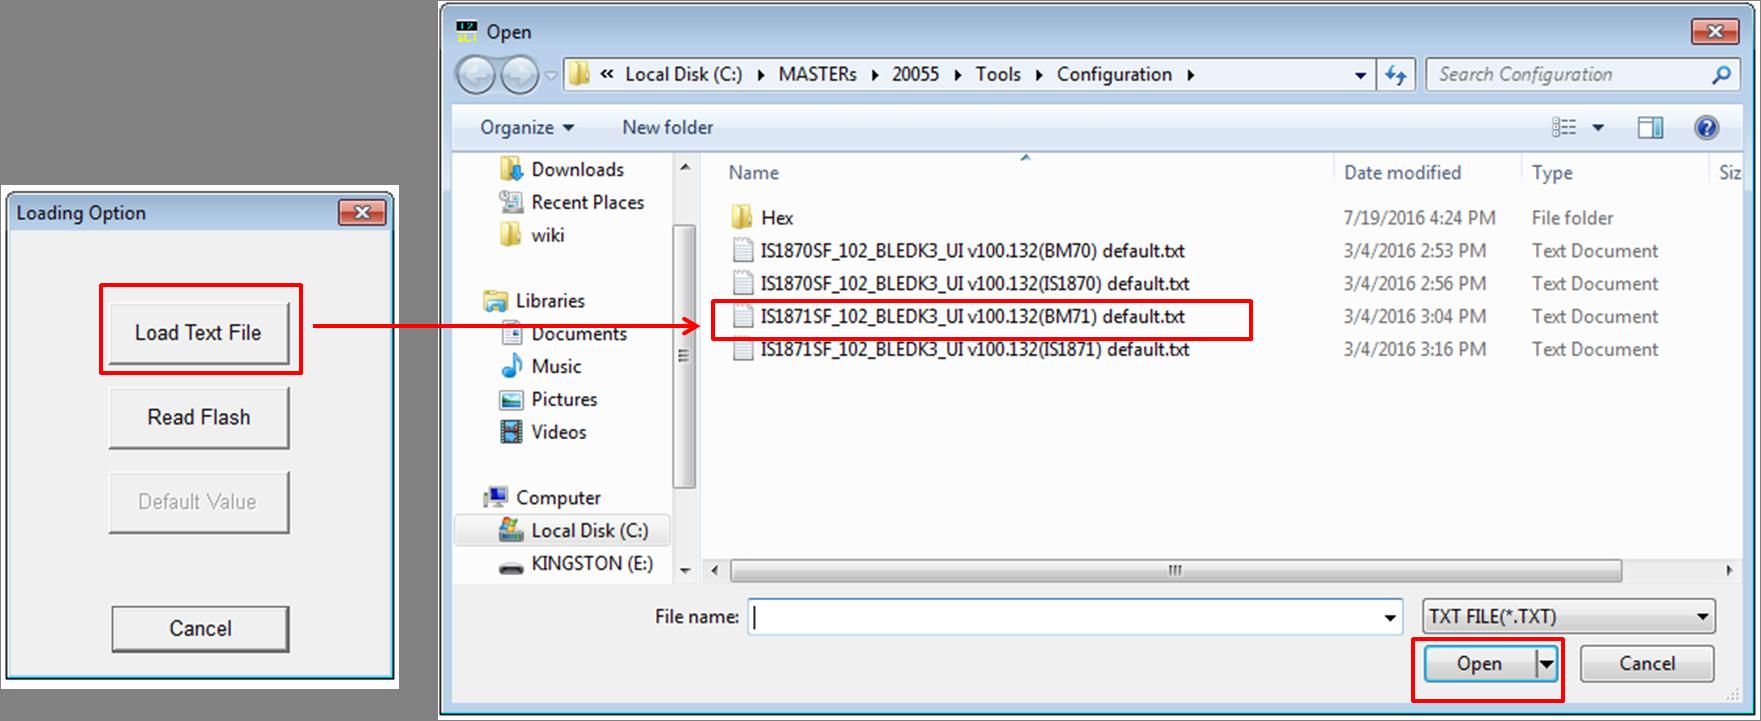 ui-config-tool-load-default.png